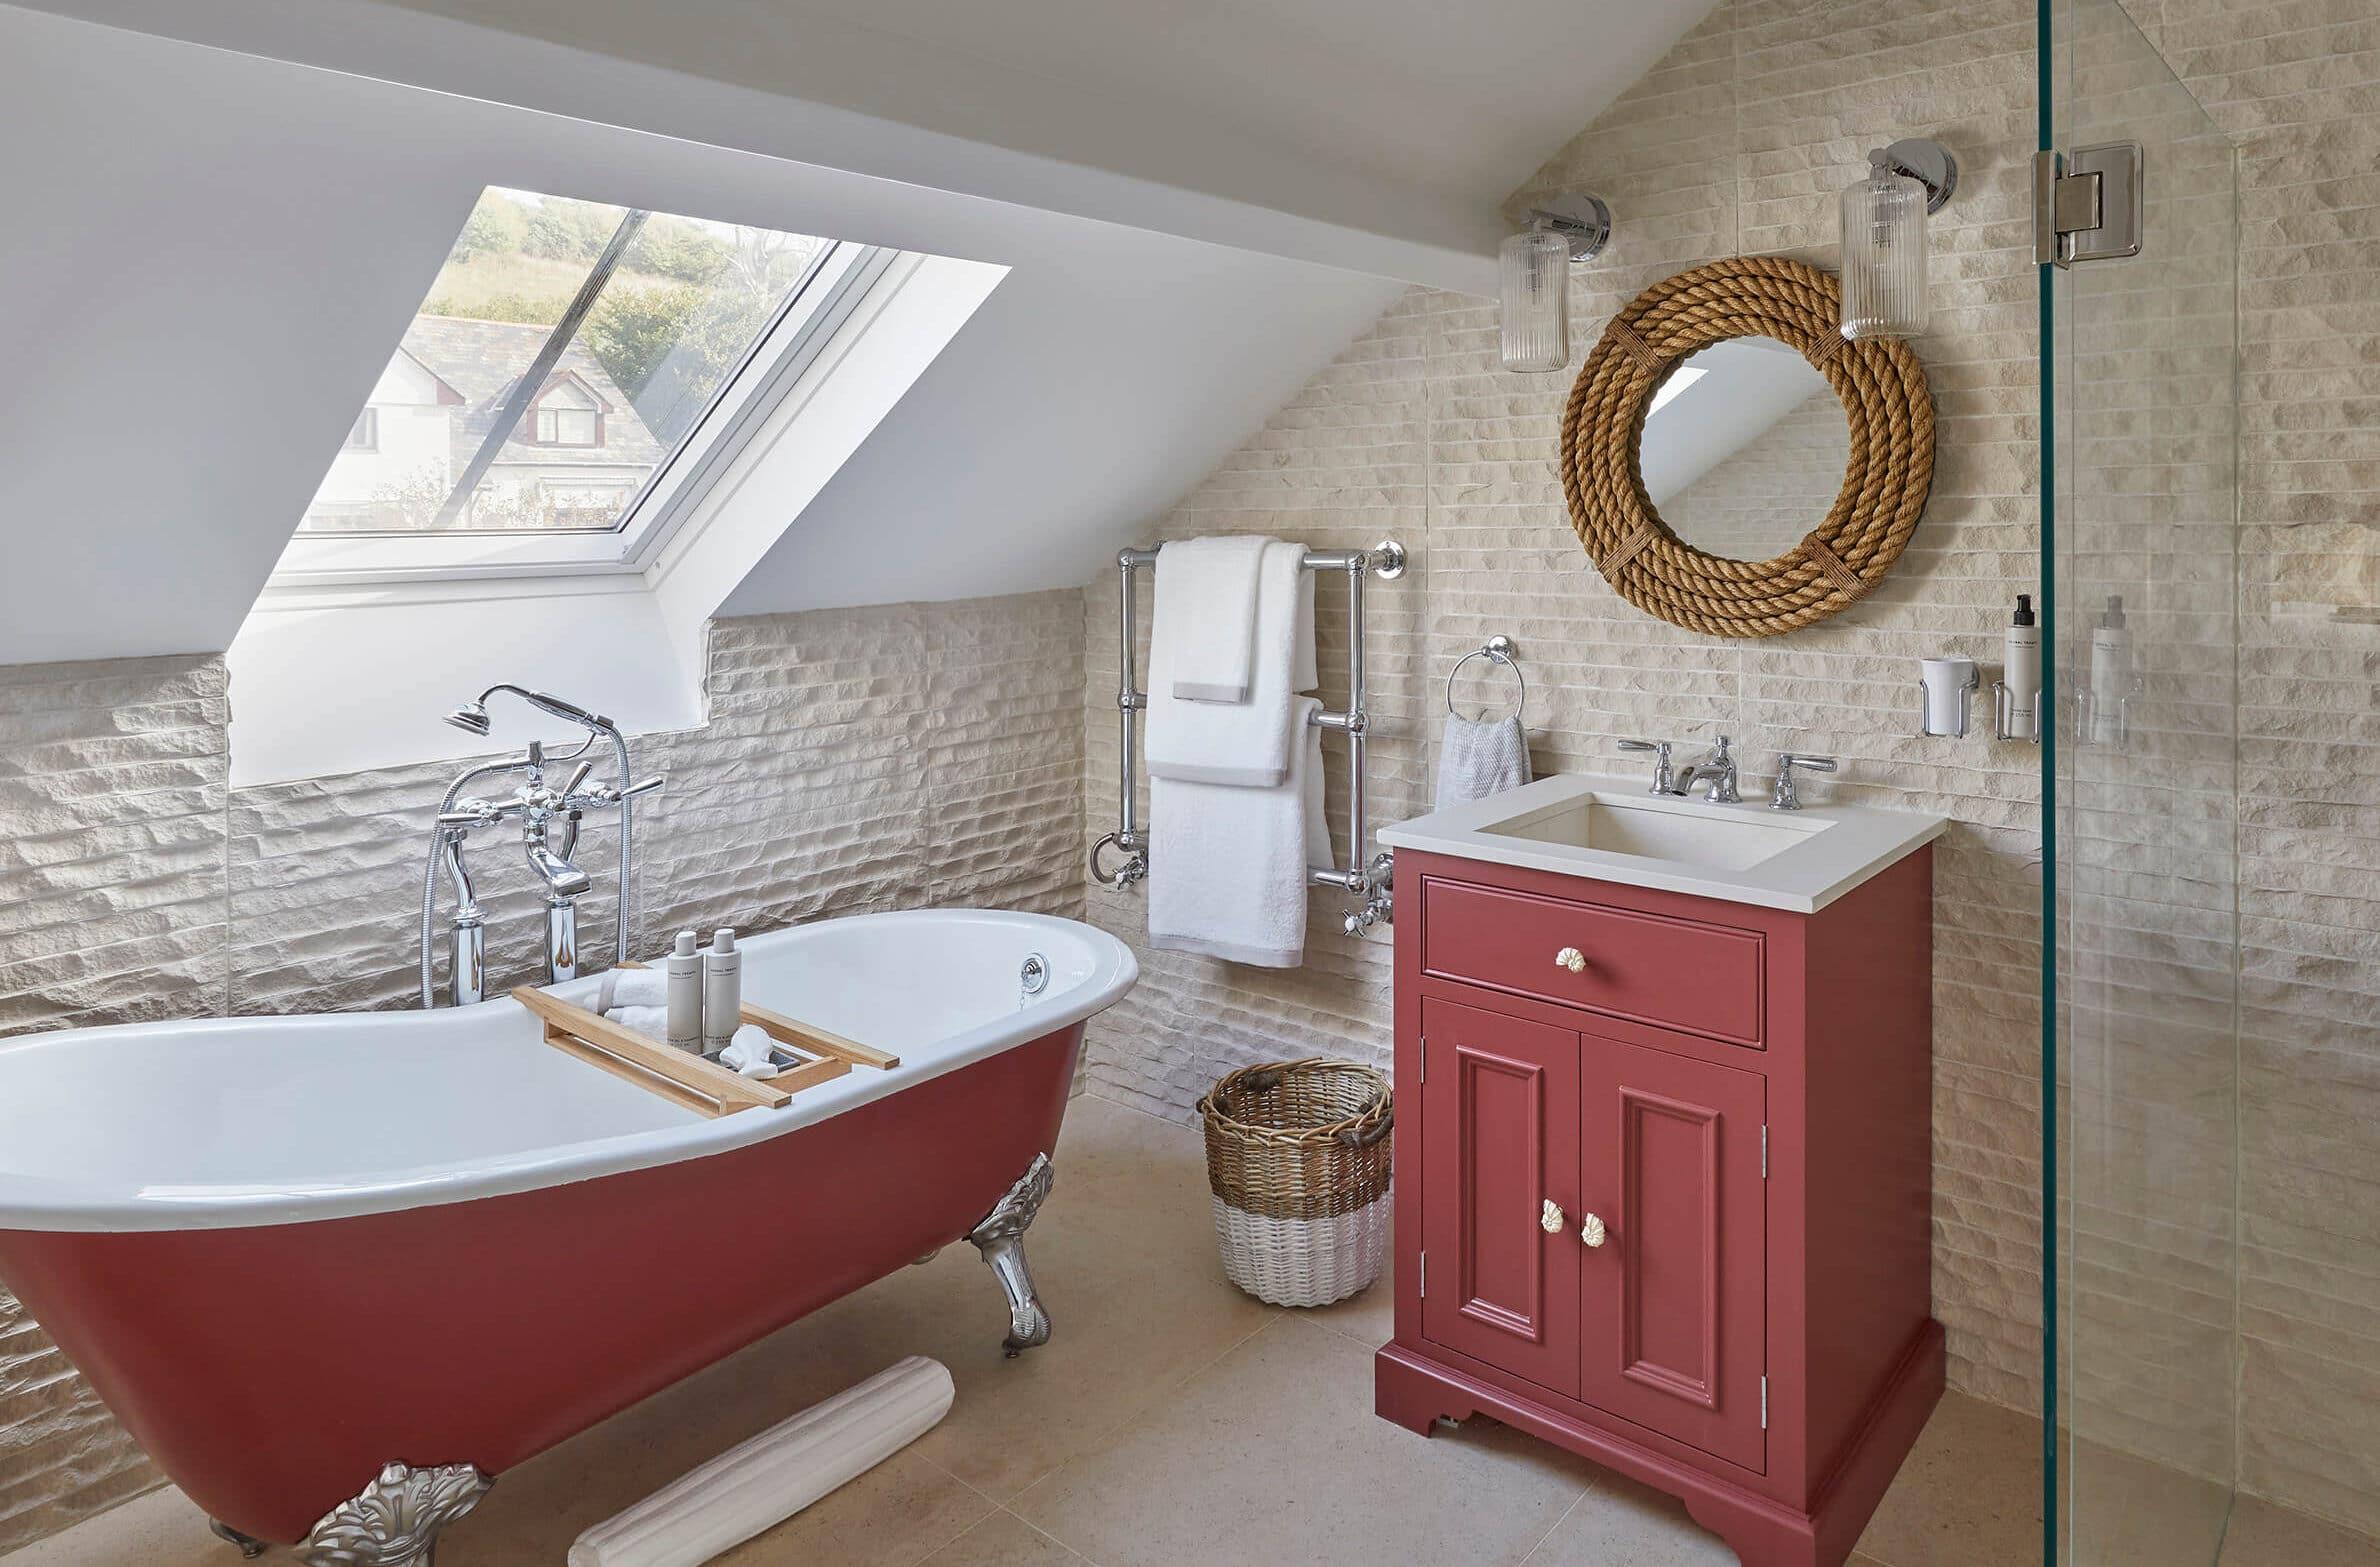 red bathroom in Devon interior design project